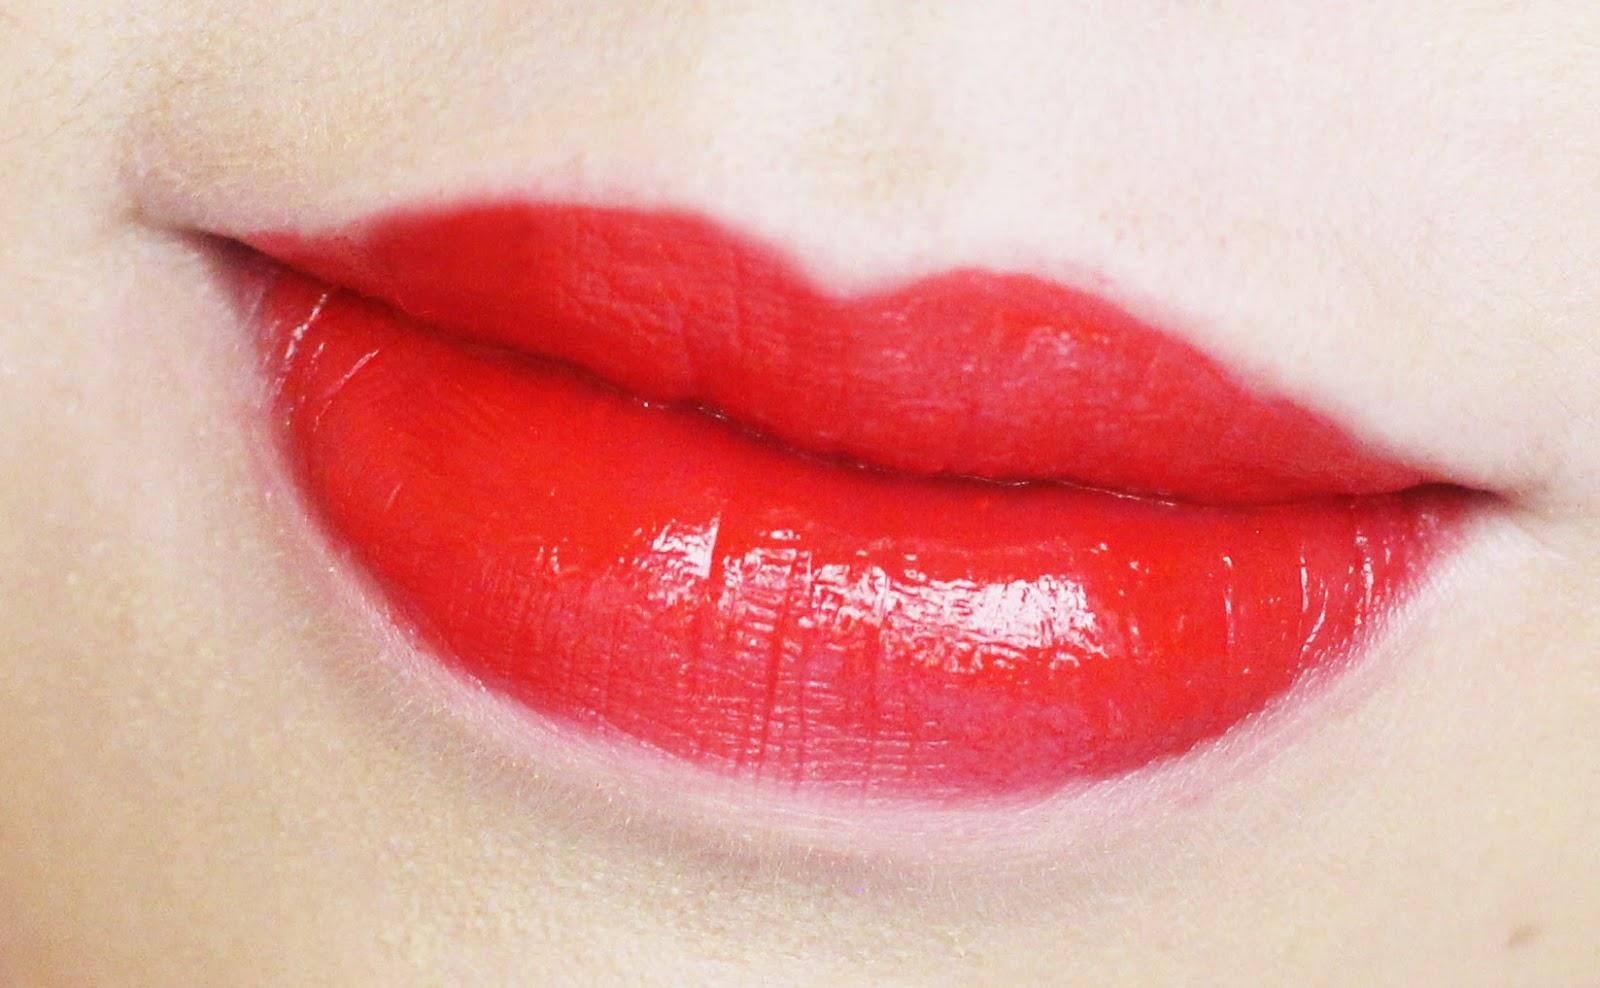 NARS Audacious Lipstick Swatches - Annabella